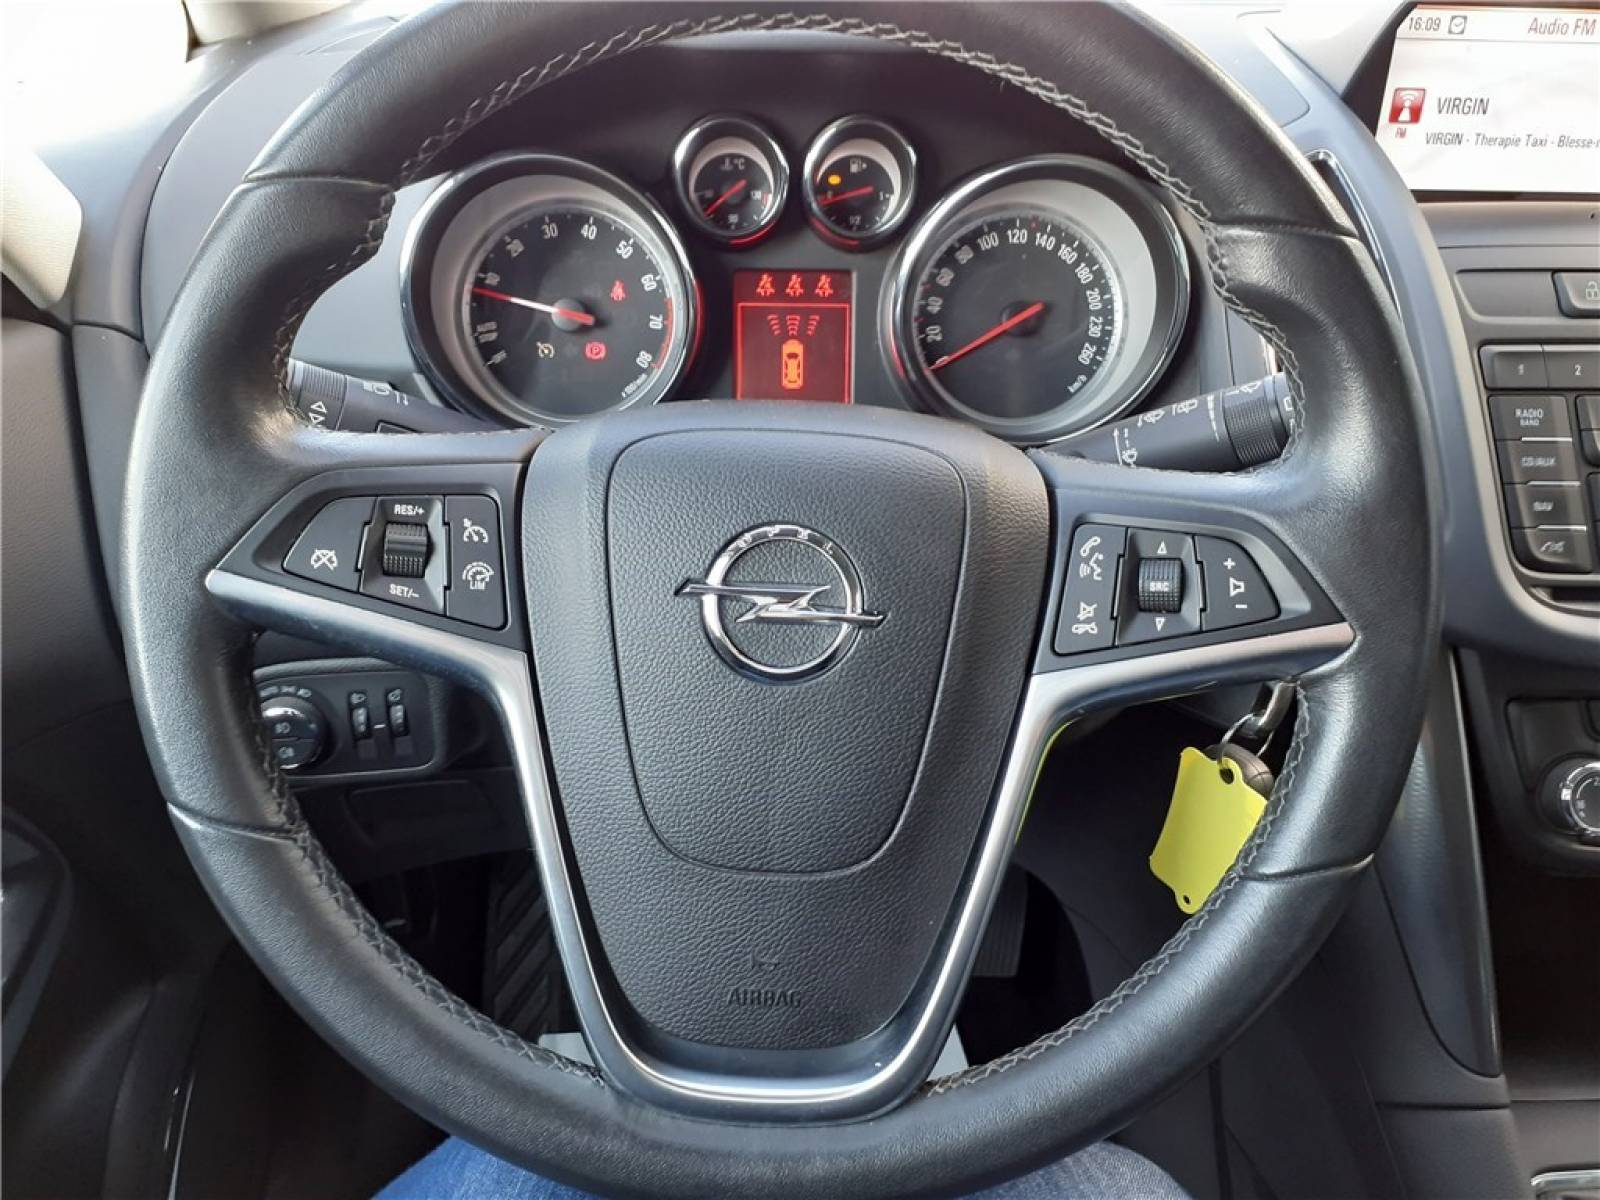 OPEL Zafira Tourer 1.4 Turbo 140 ch Start/Stop EcoFlex - véhicule d'occasion - Groupe Guillet - Opel Magicauto - Chalon-sur-Saône - 71380 - Saint-Marcel - 36